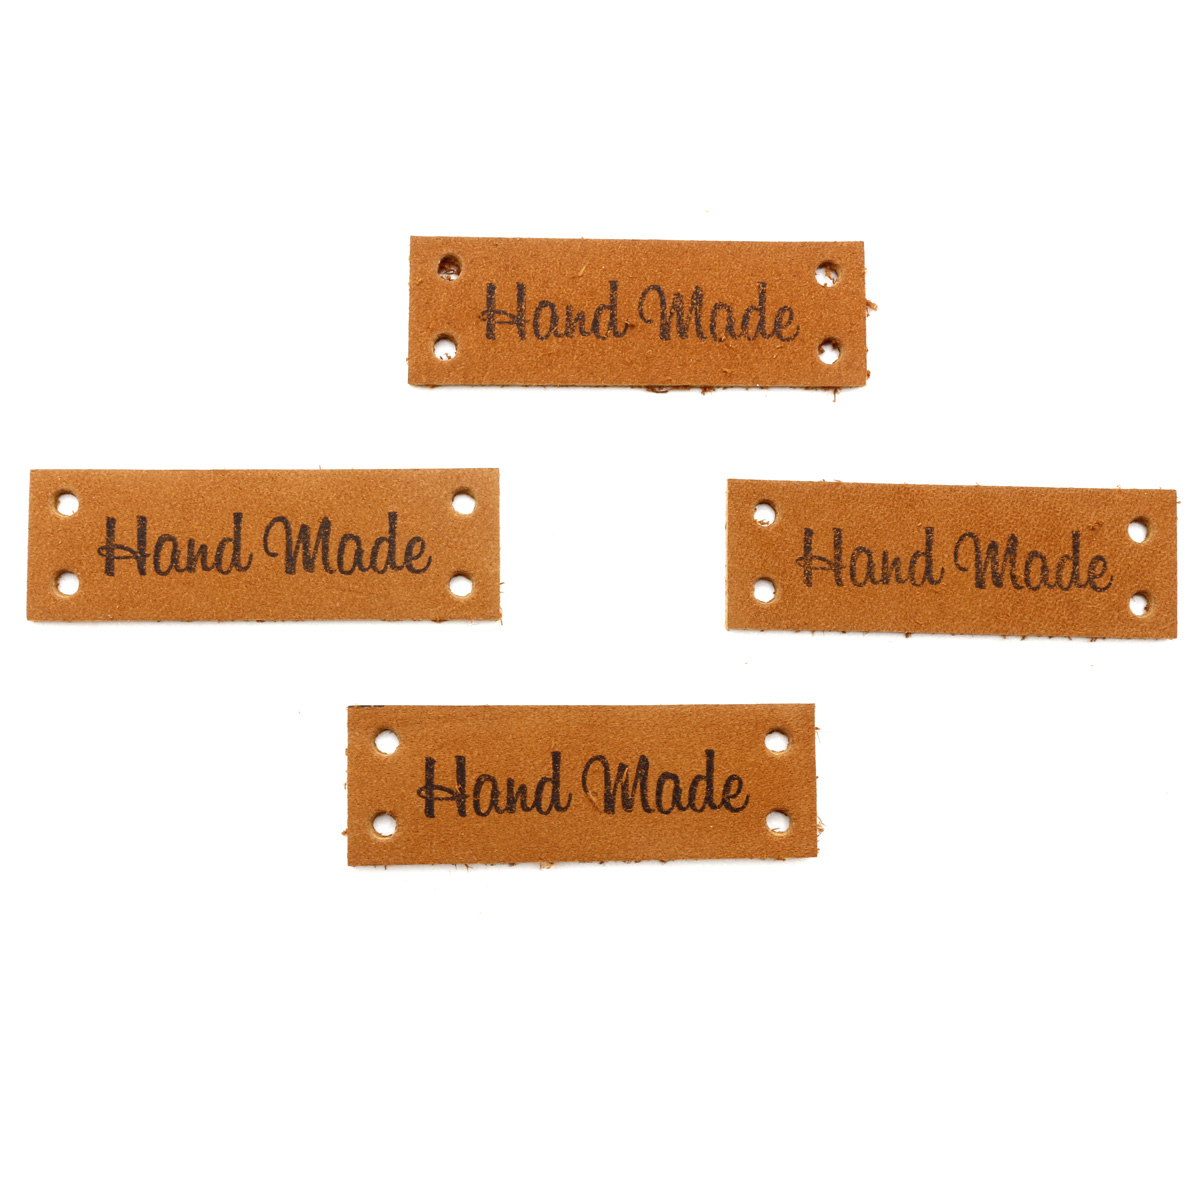 Набор кожаных бирок пришивных 'Hand Made' 1,4*4см, цв. коричн., уп.8шт